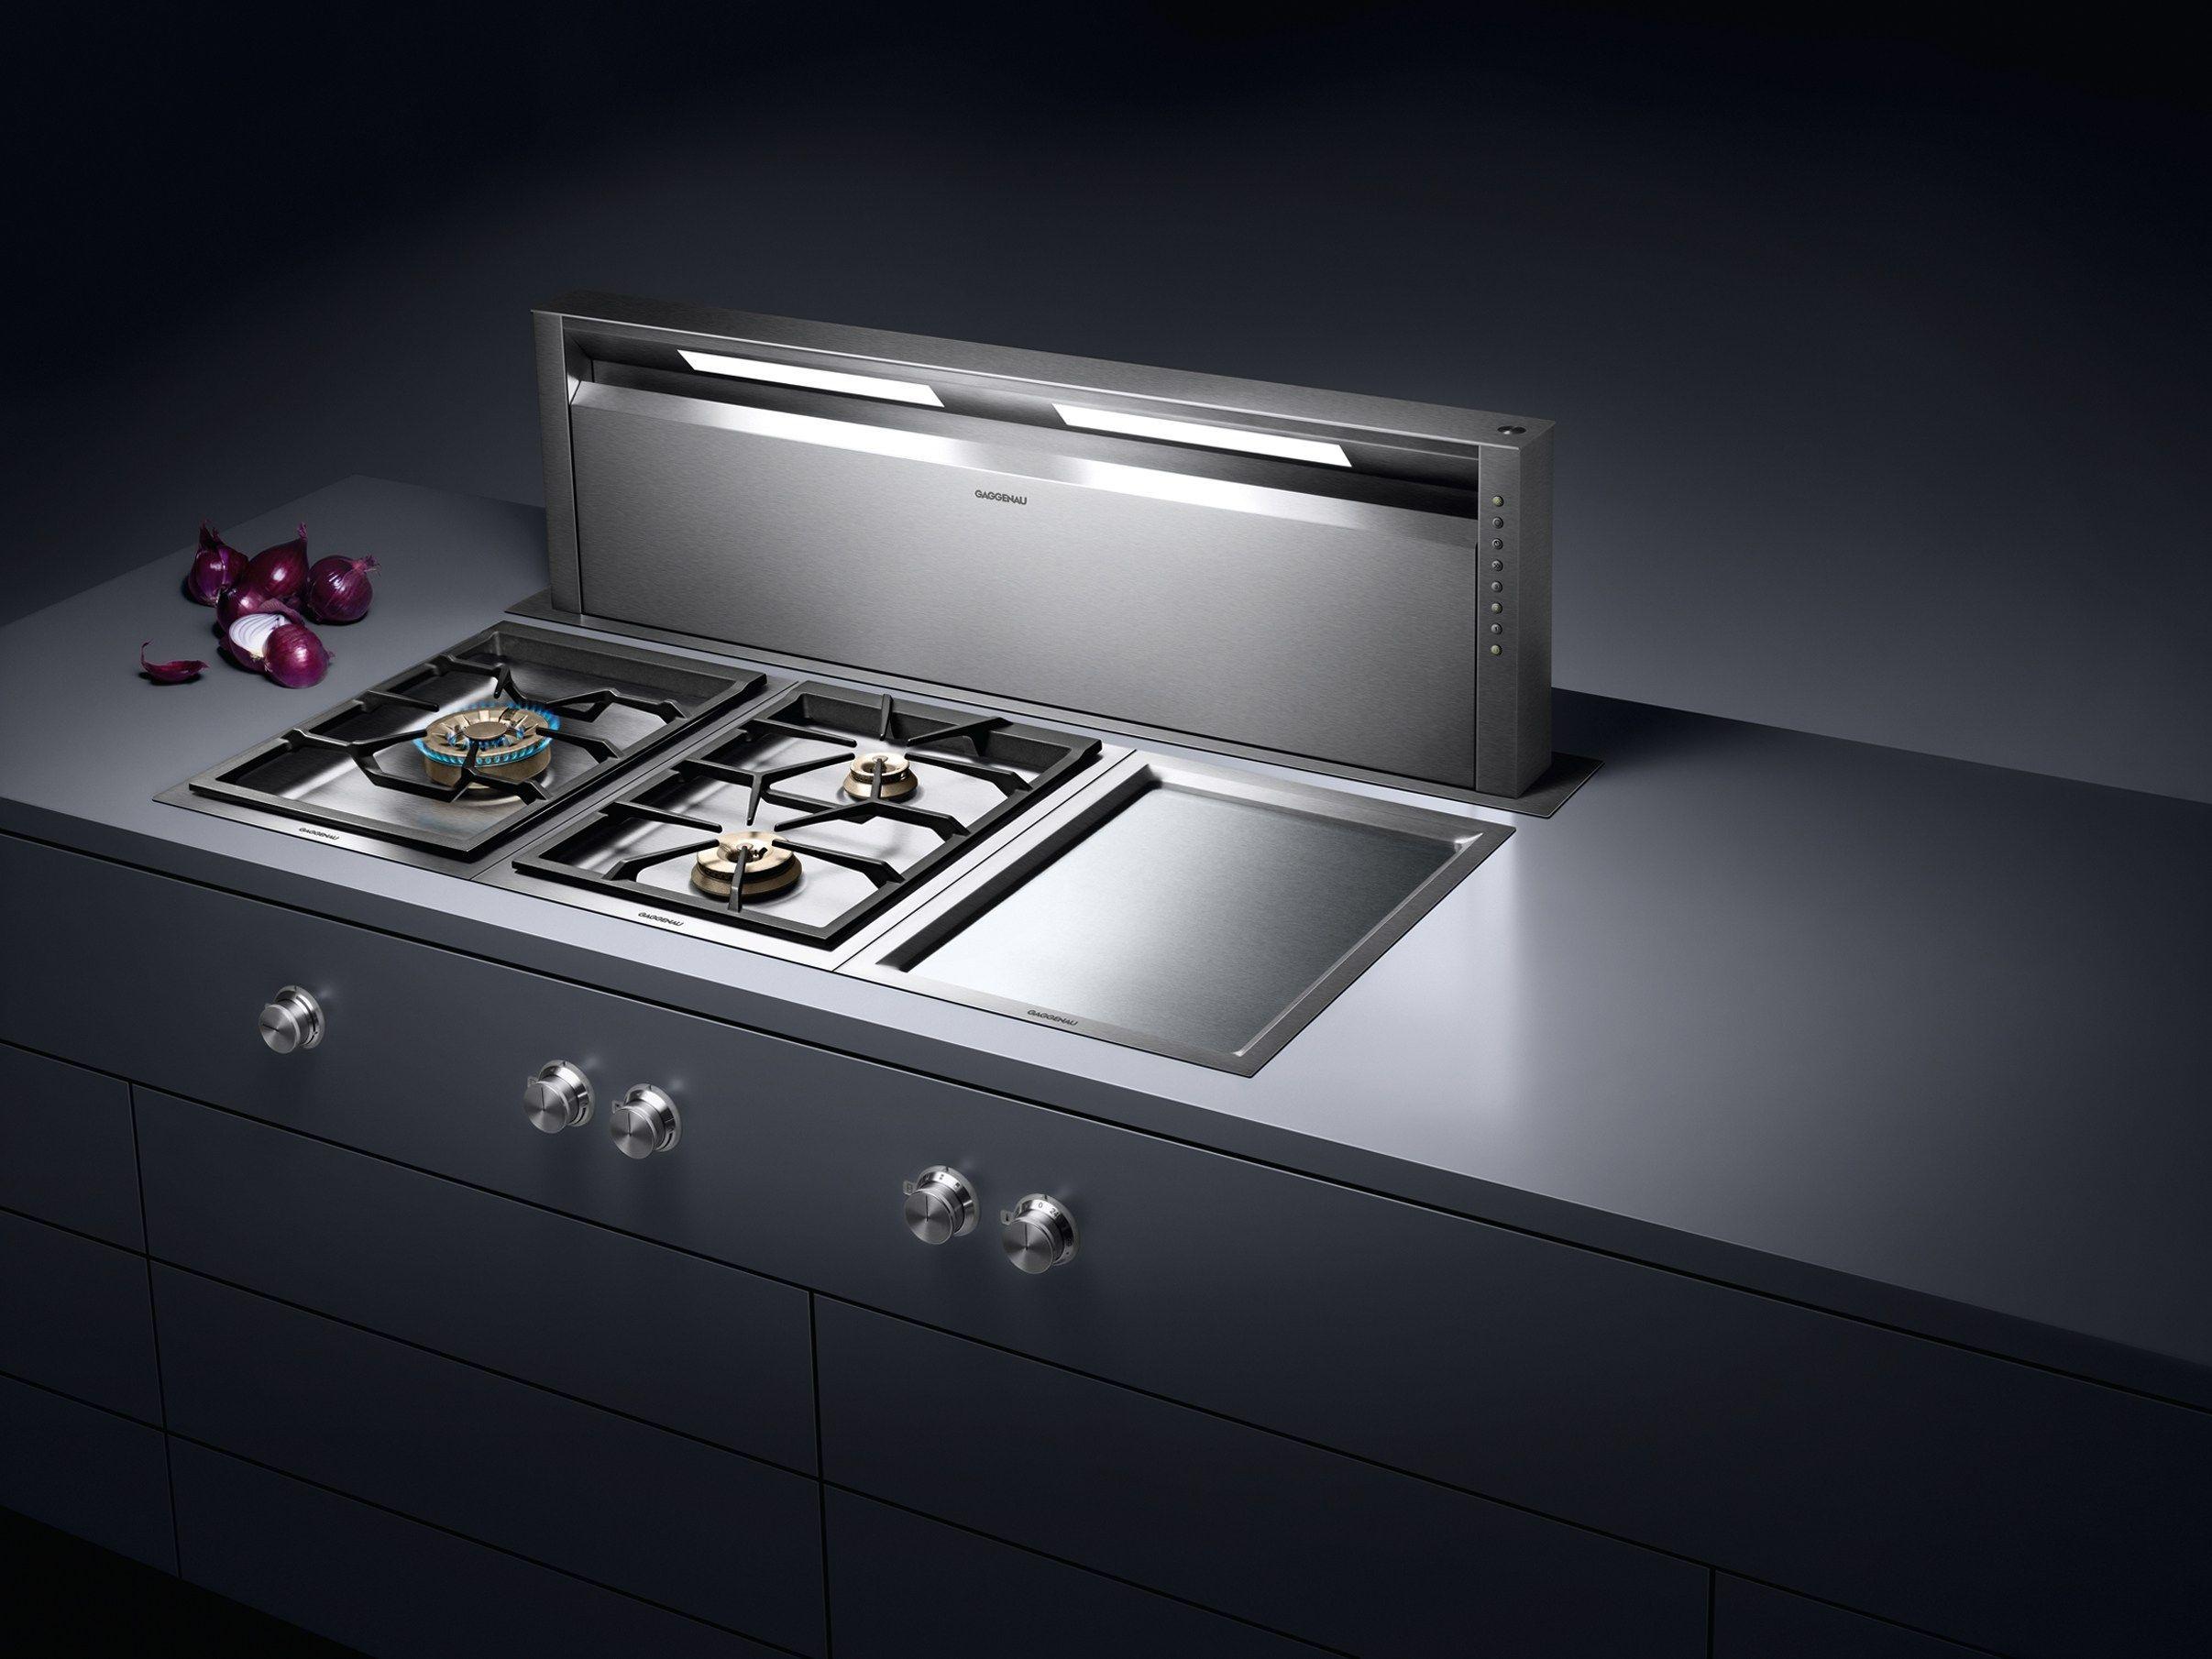 Kitchens Electric Home Campana Extractora Gaggenau Appliances  # Muebles De Cocina Gaggenau